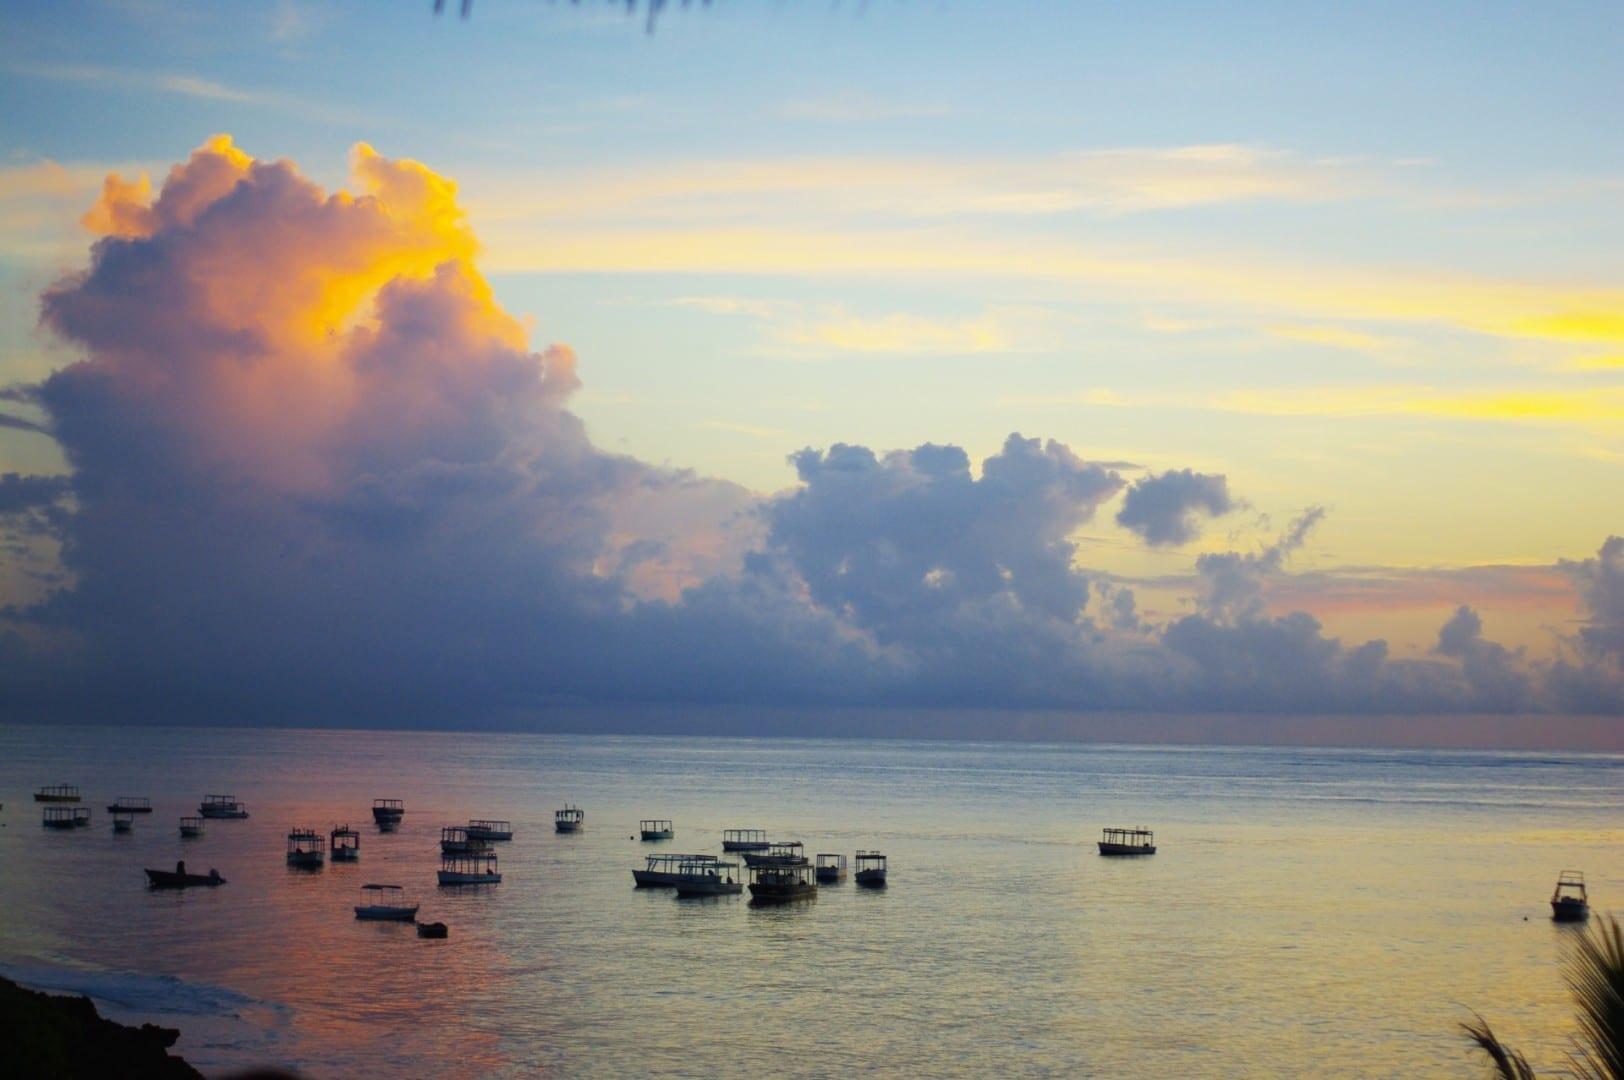 Barcos en Malindi Malindi Kenia